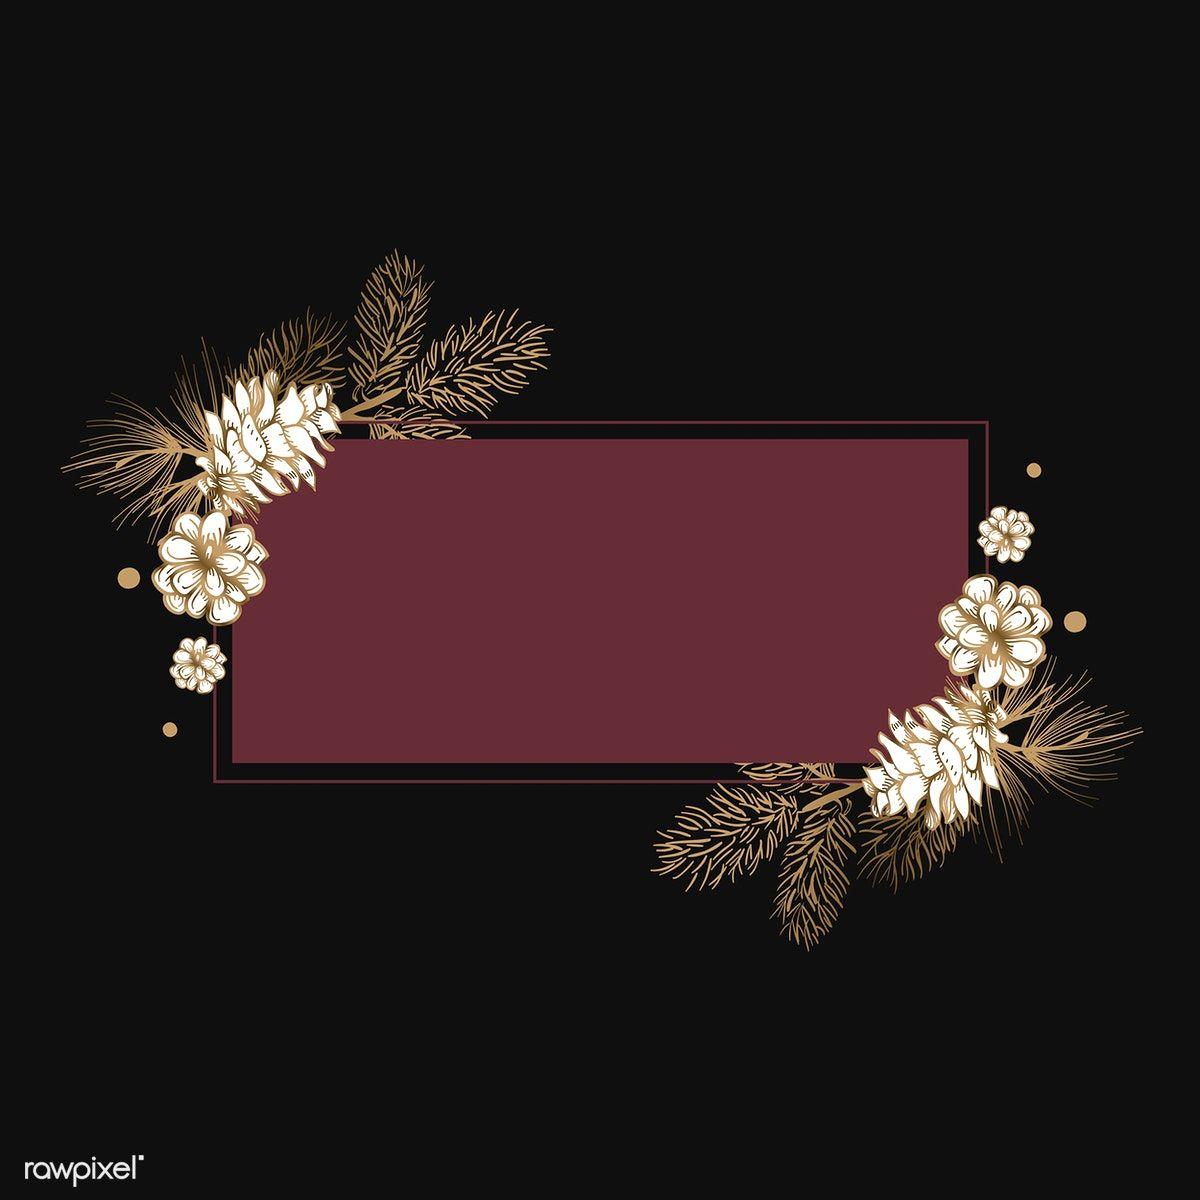 Download free vector of Floral framed wedding invitation vector by Sicha about Burgundy floral background, flower border, mockup, burgundy wedding  background, and wedding invite mockup 553609